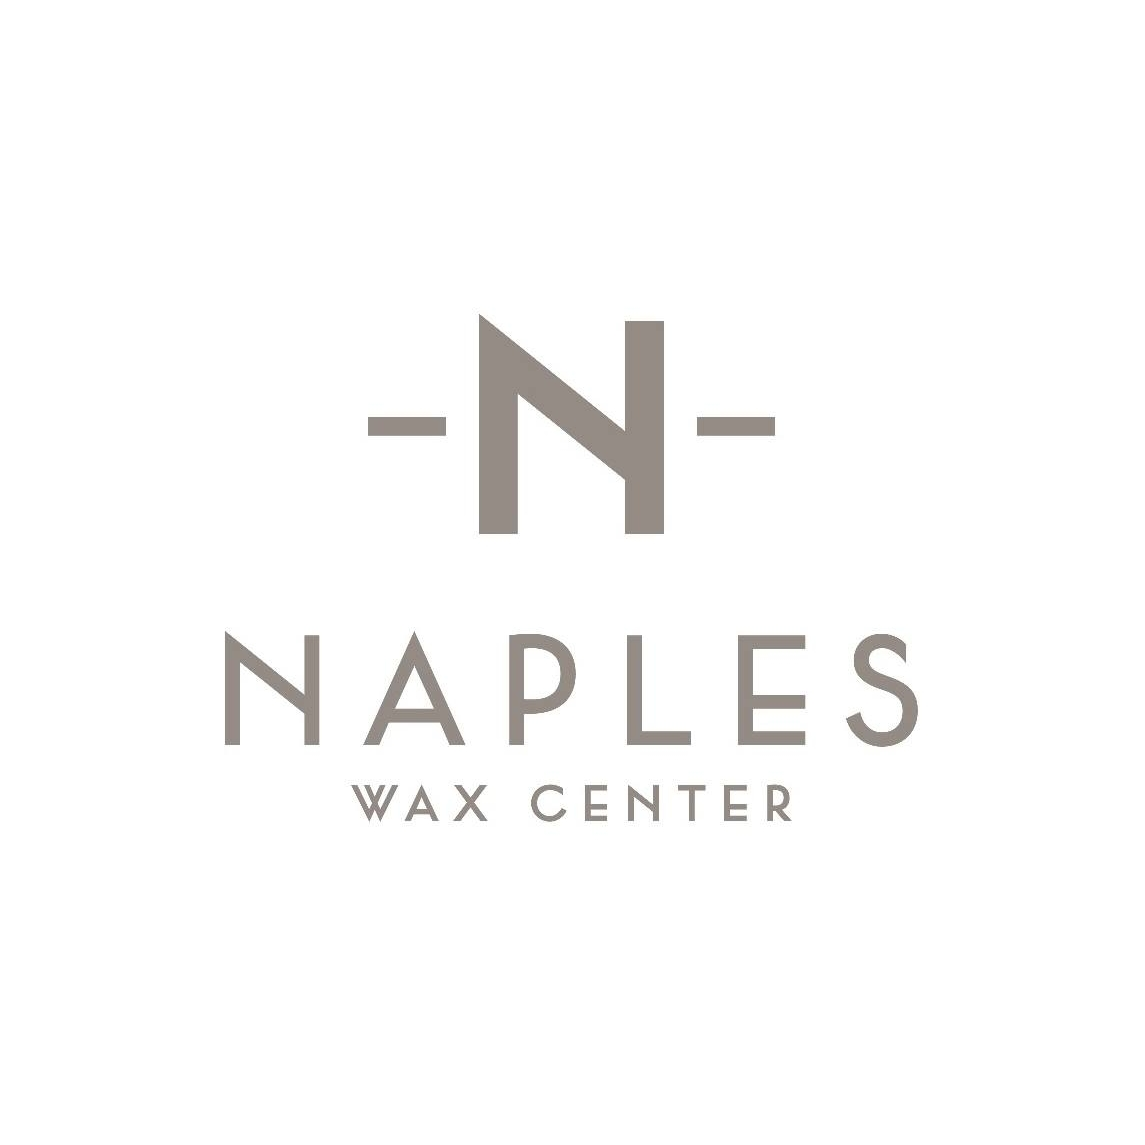 Naples Wax Center image 0